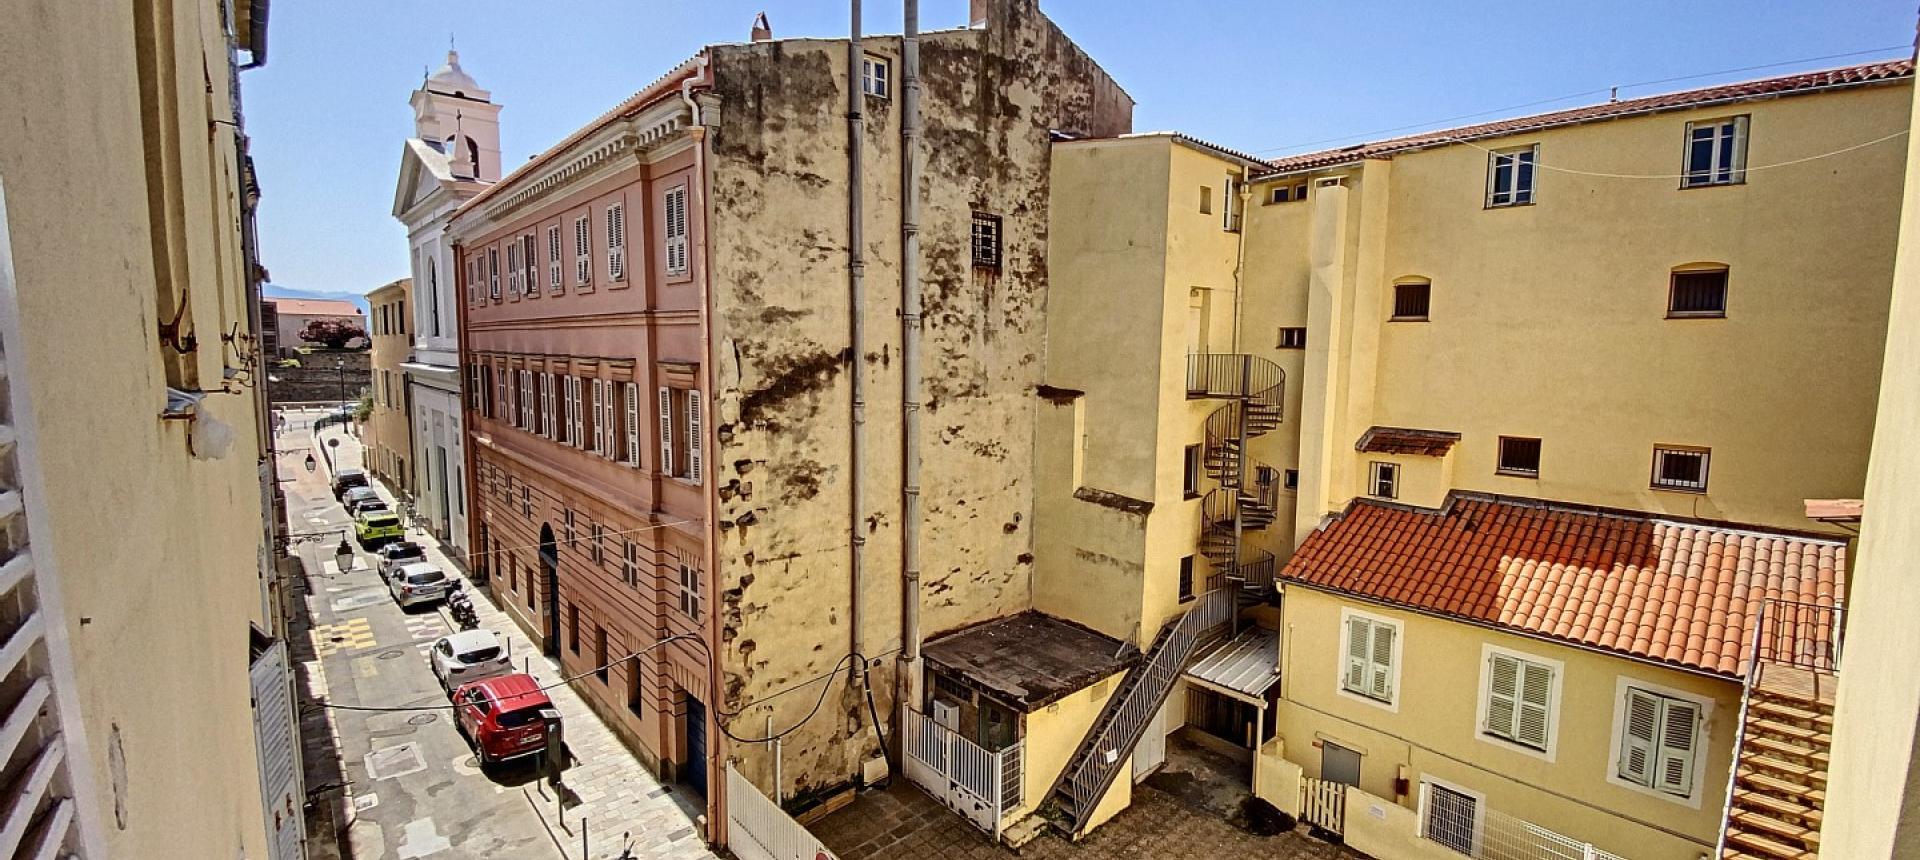 Vente d'un appartement F2 rénové-Centre historique Ajaccio - RUE FORCIOLI CONTI